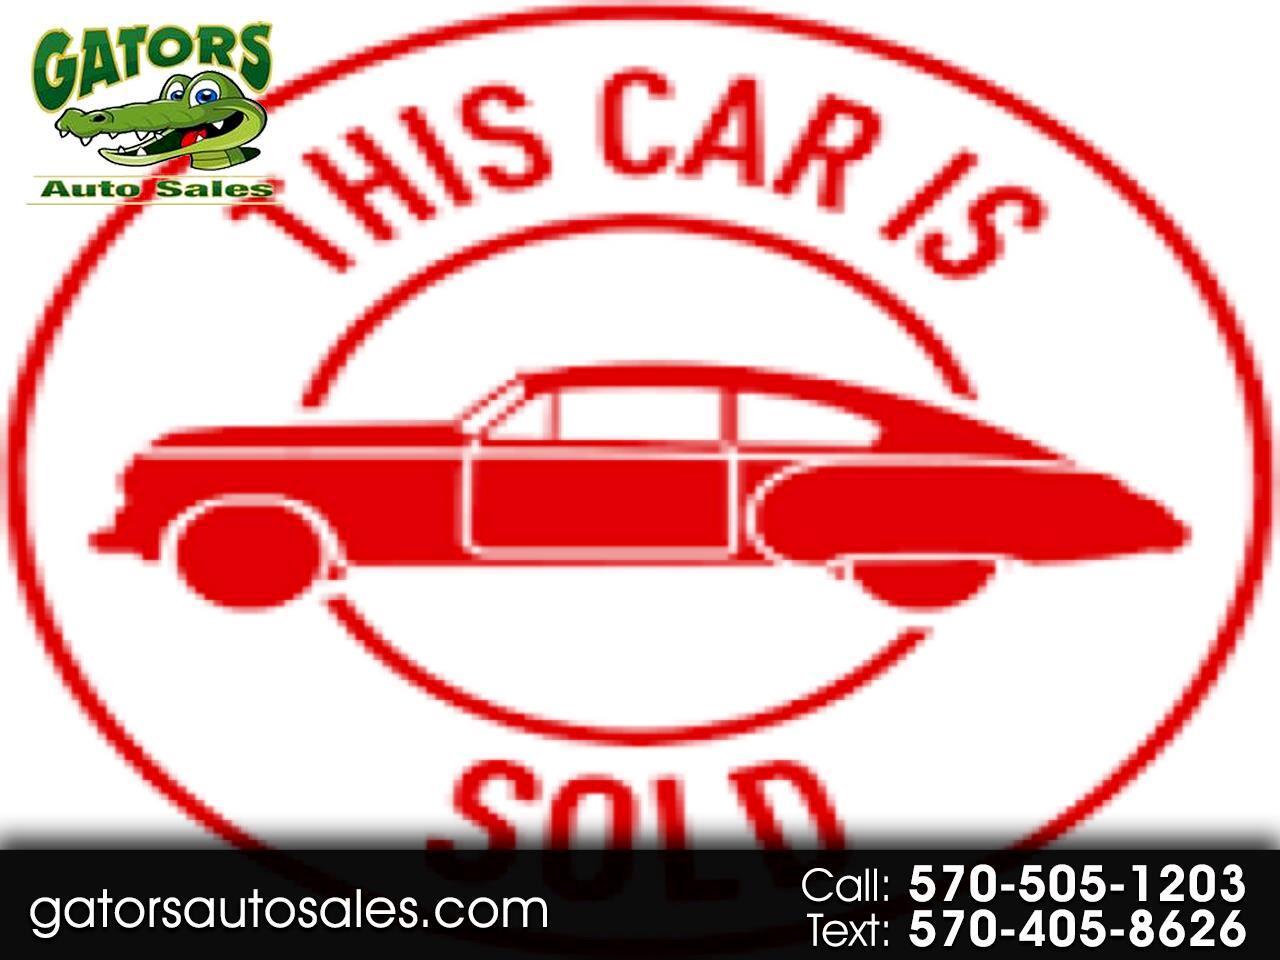 Ford Focus Wagon SE 2003